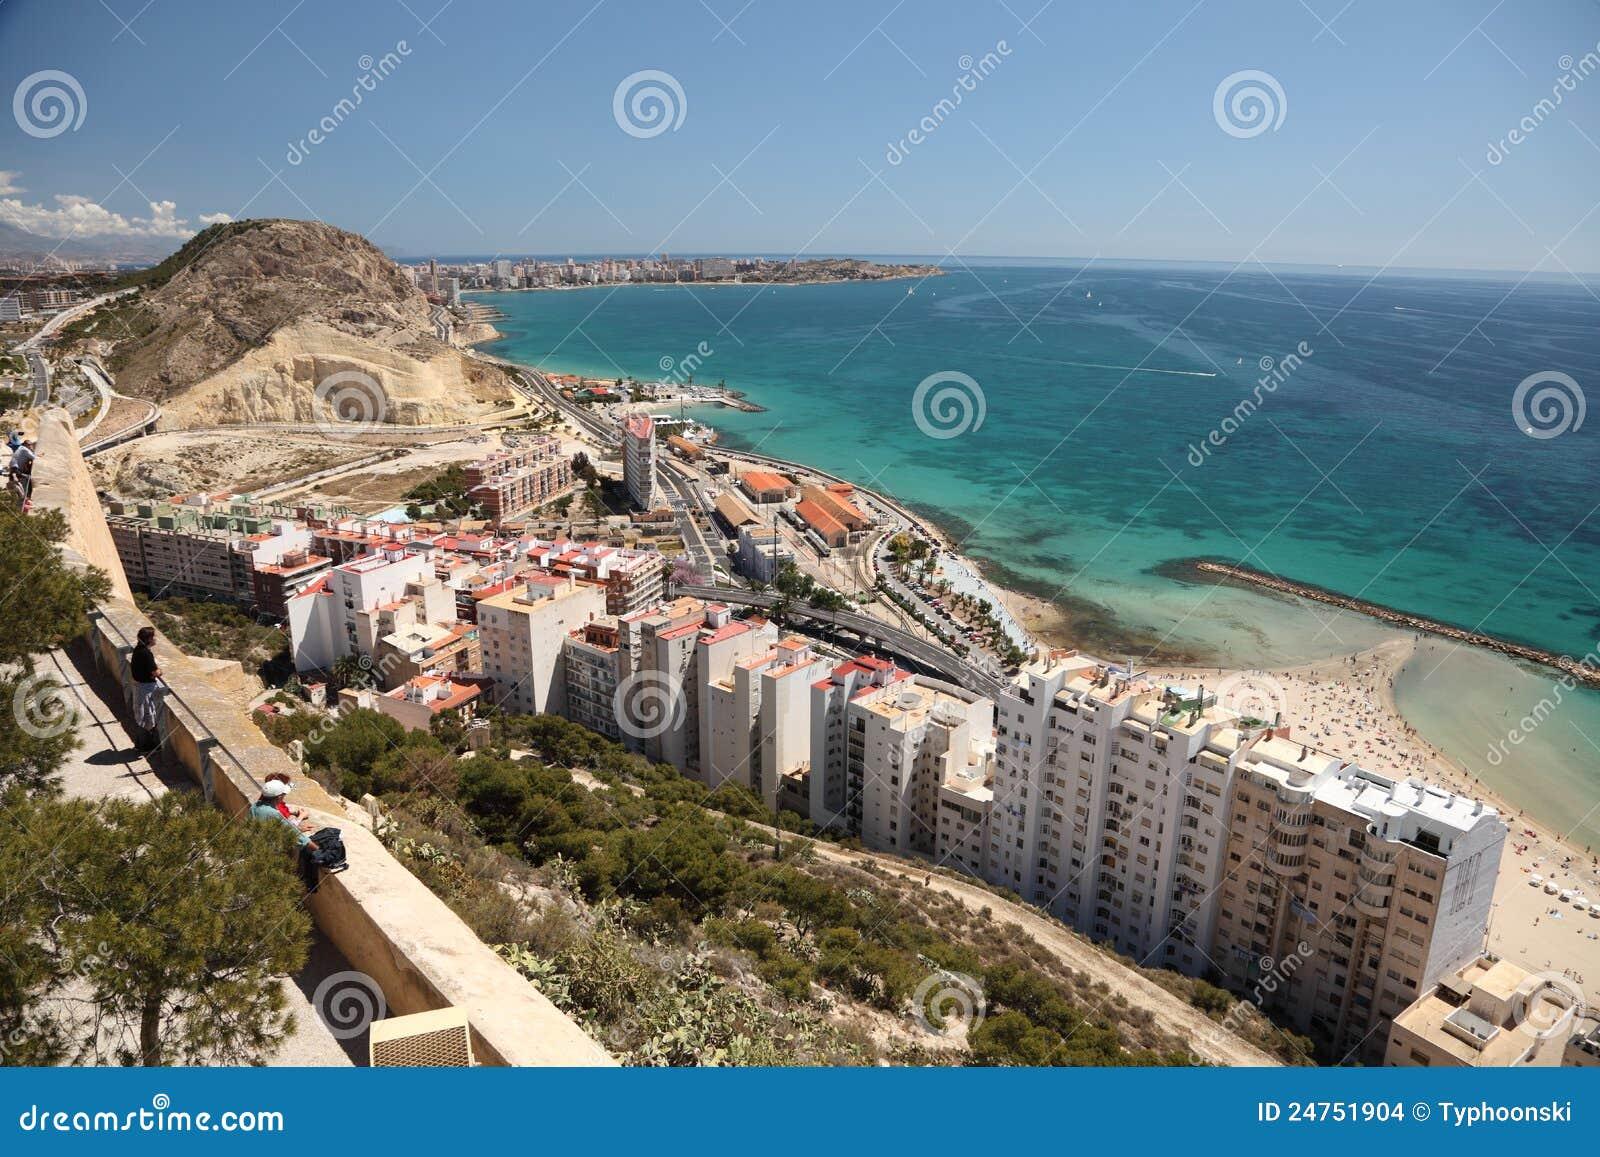 Seaside view of alicante spain editorial stock image image 24751904 - Stock uno alicante ...